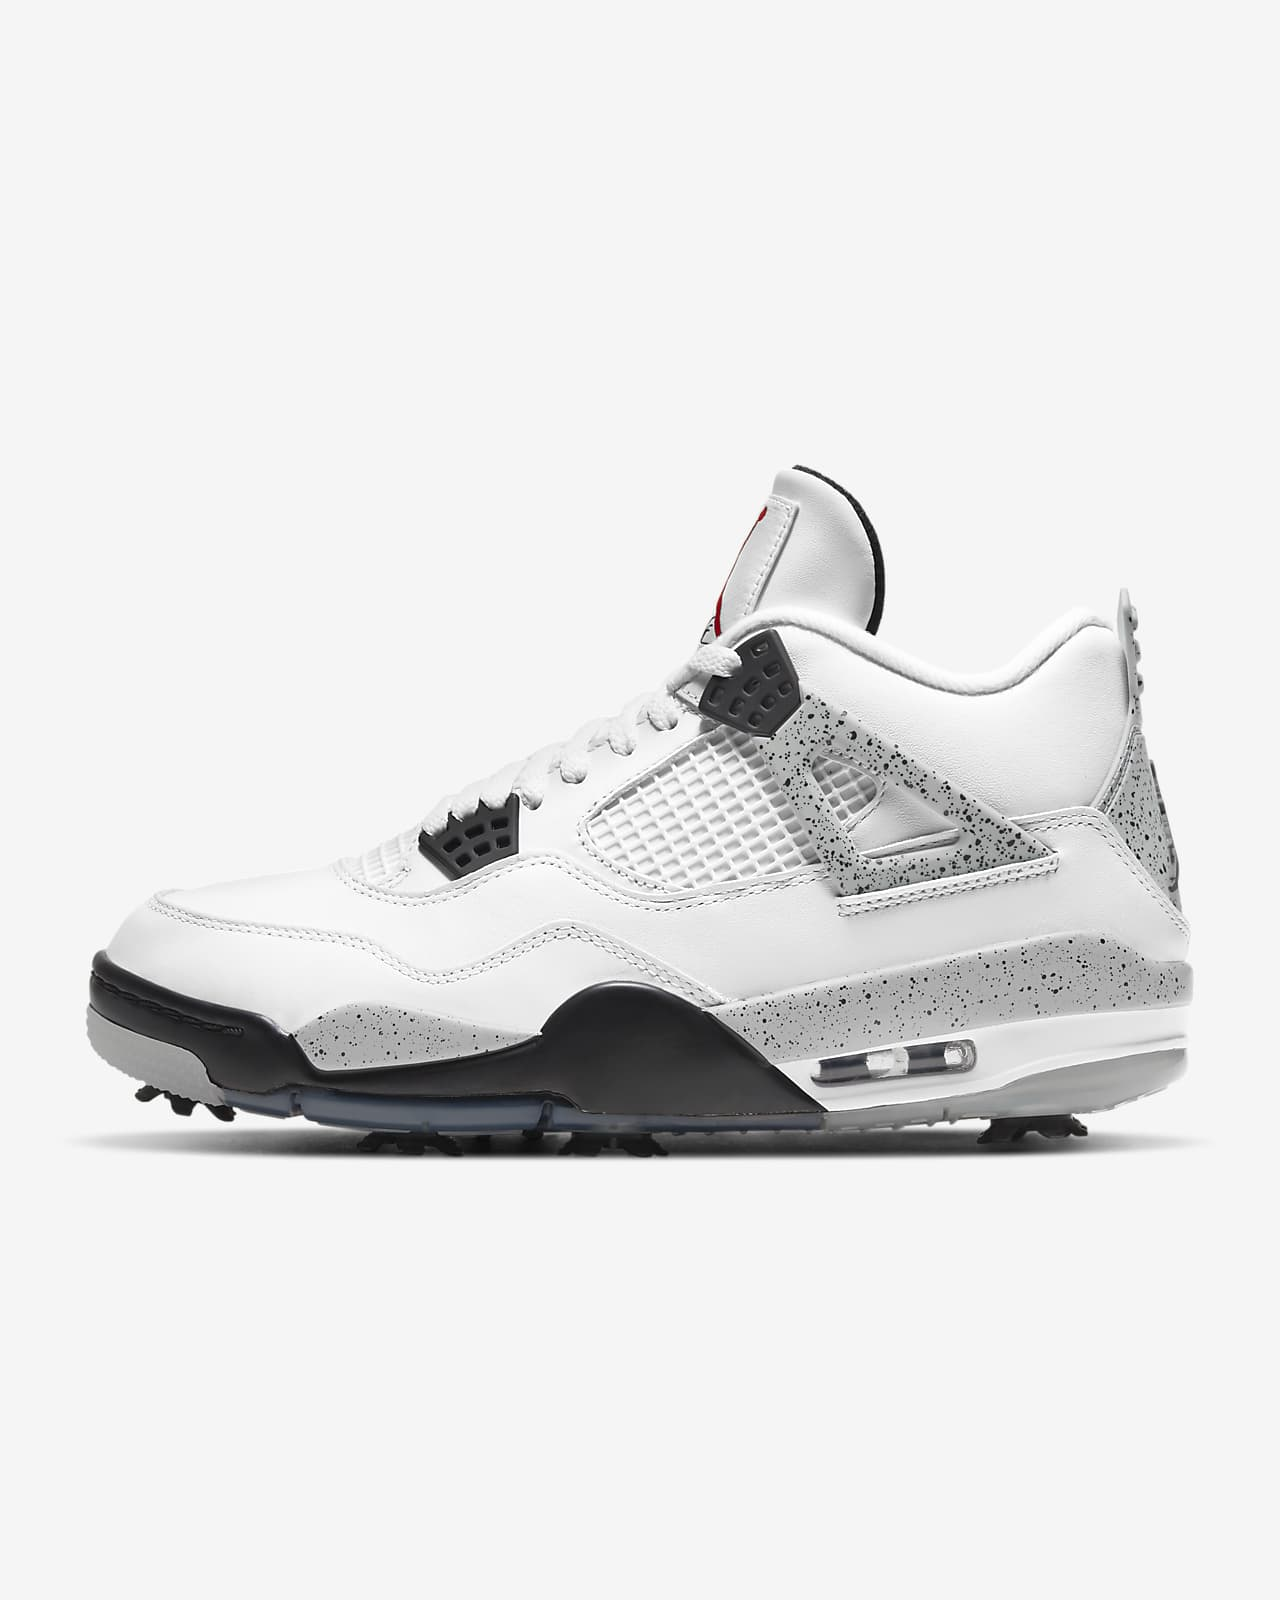 Jordan 4 G Golf Shoe